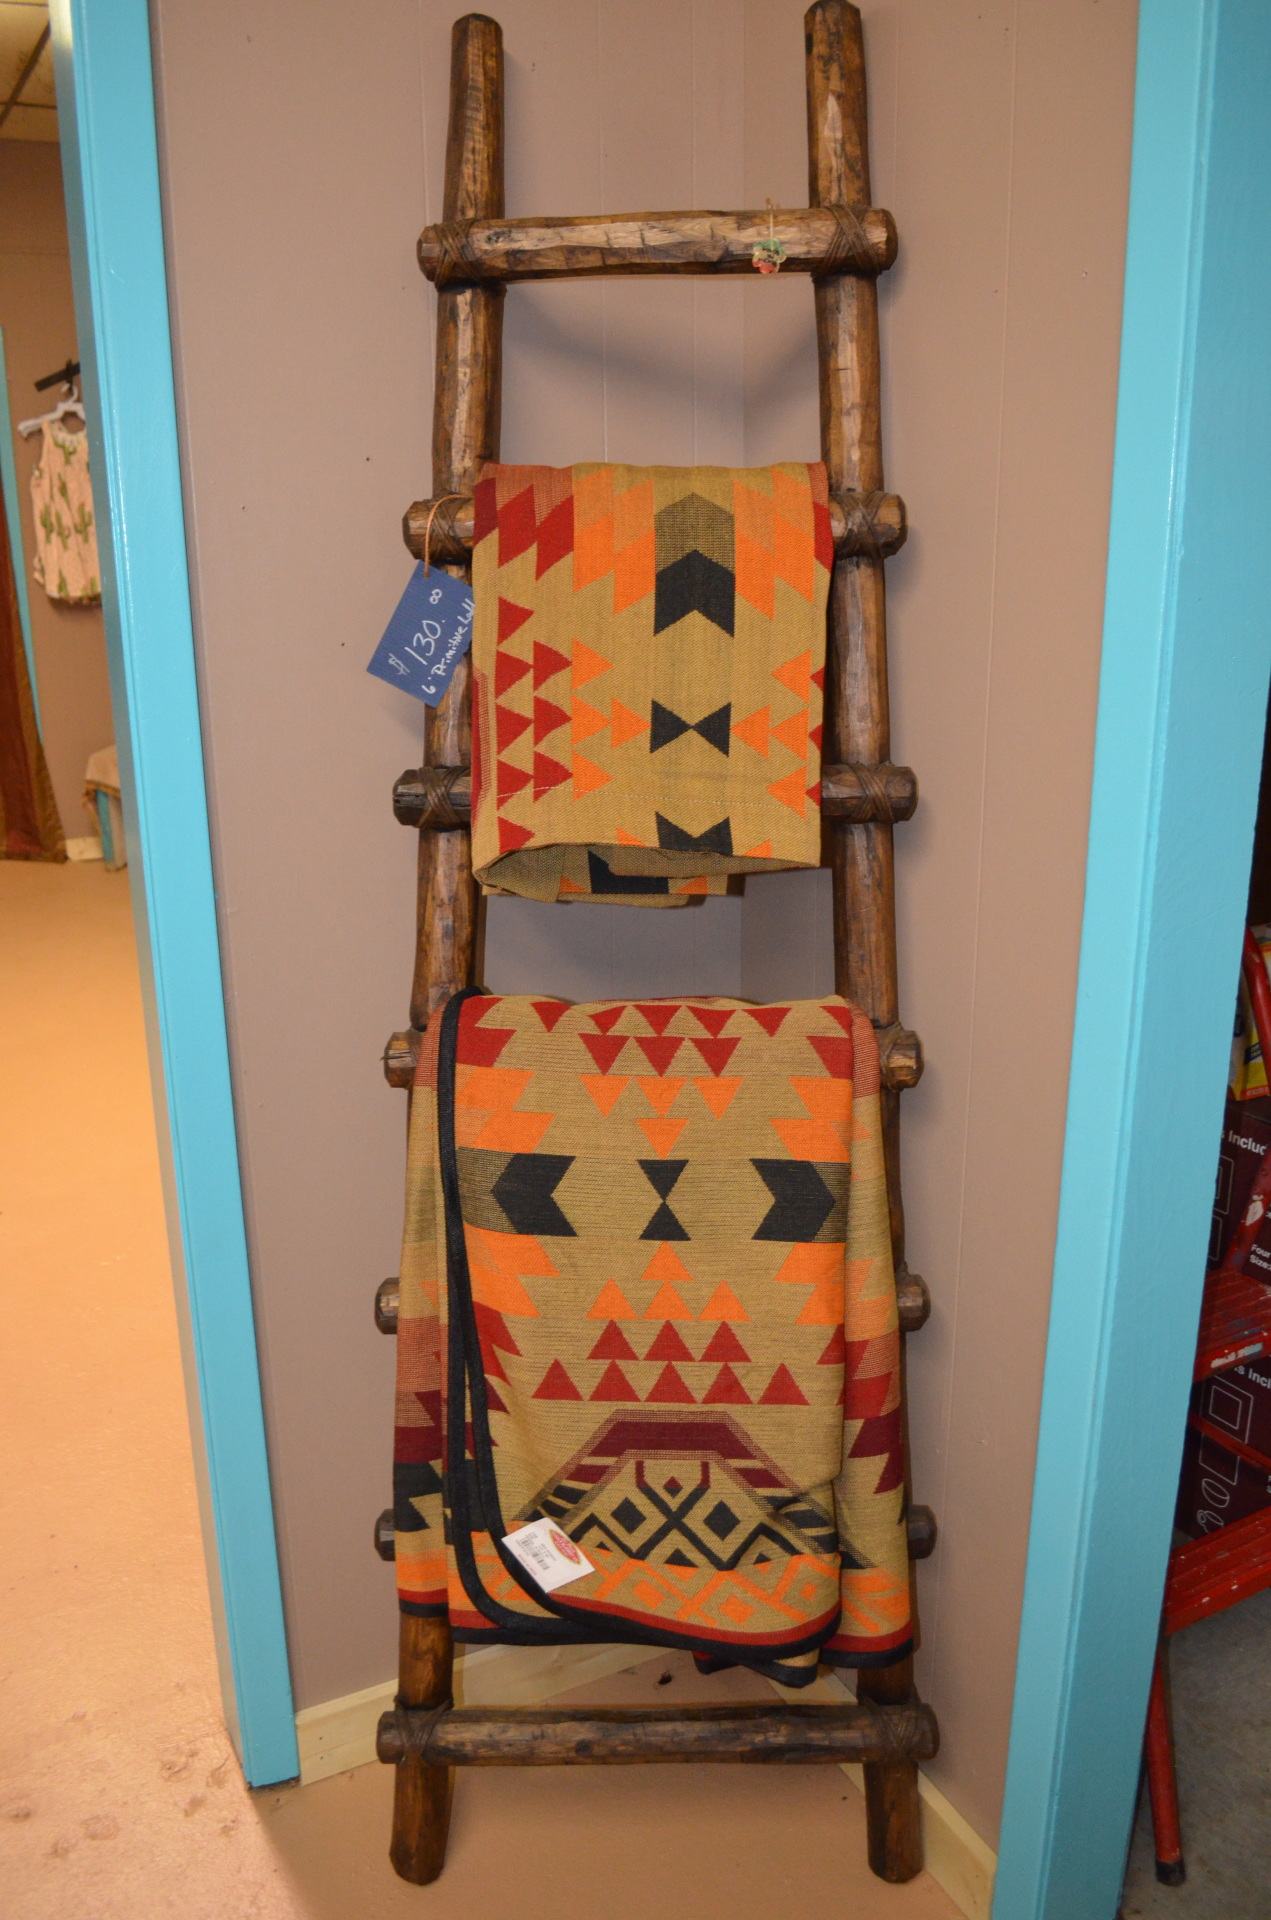 6' Decorative Ladder